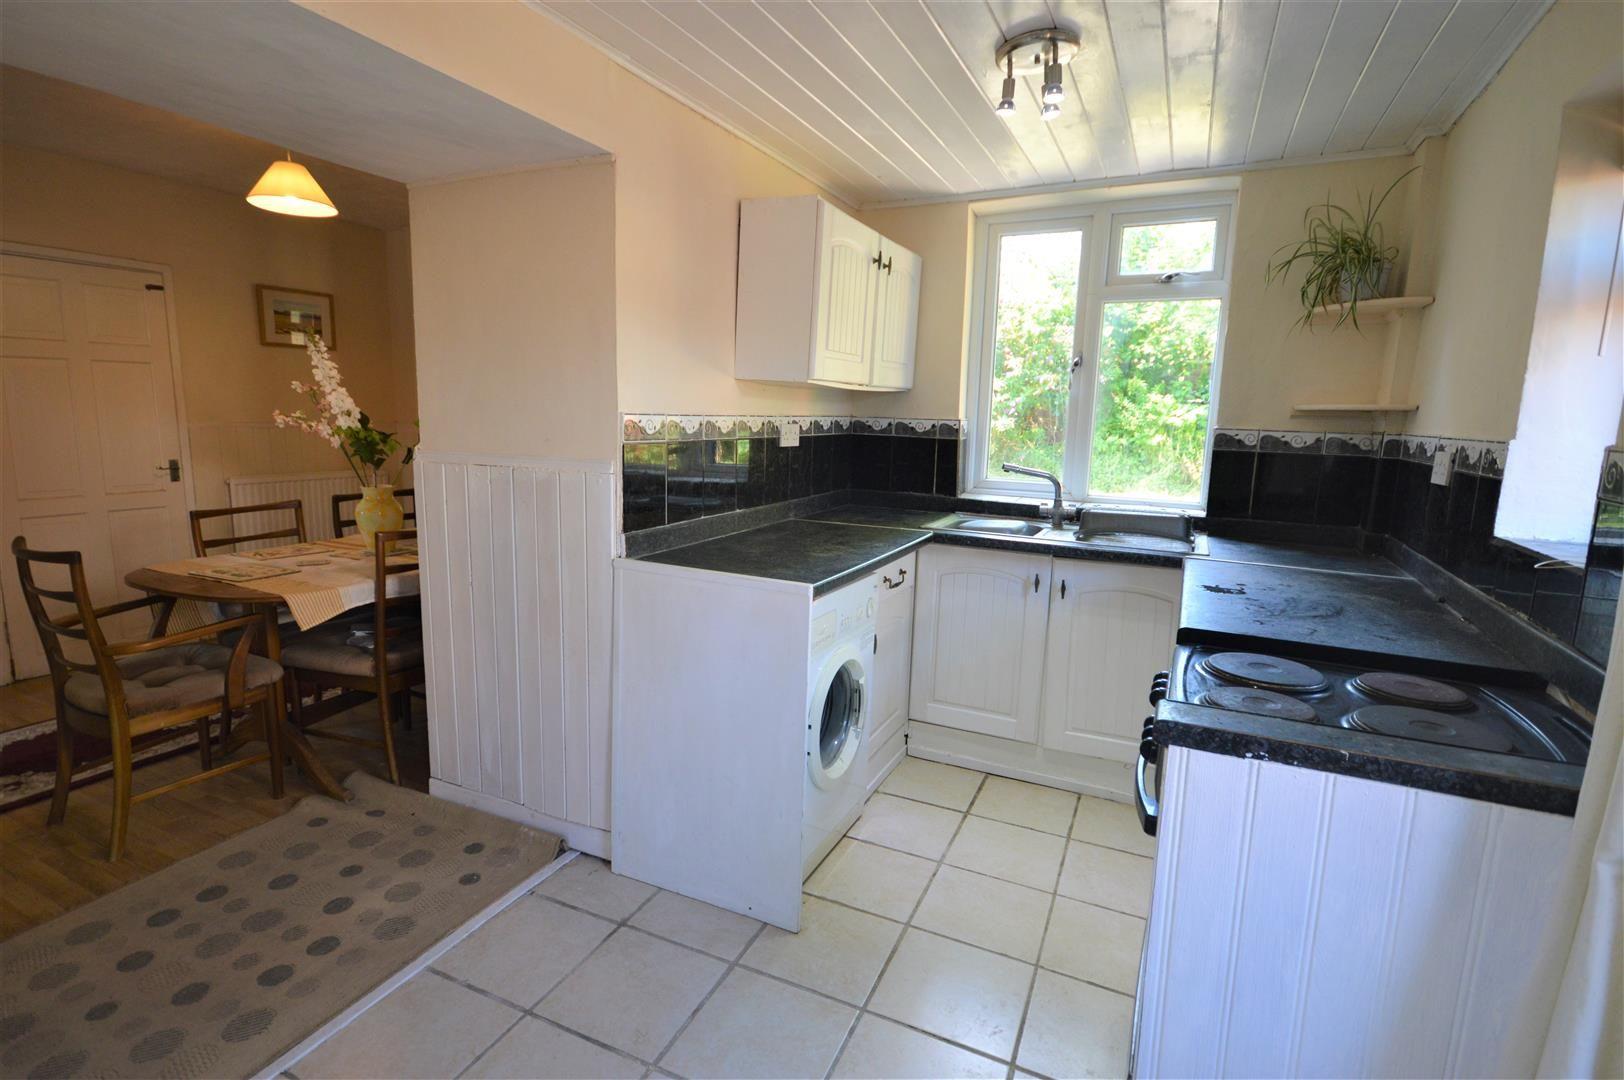 4 bed semi-detached for sale in Presteigne 6